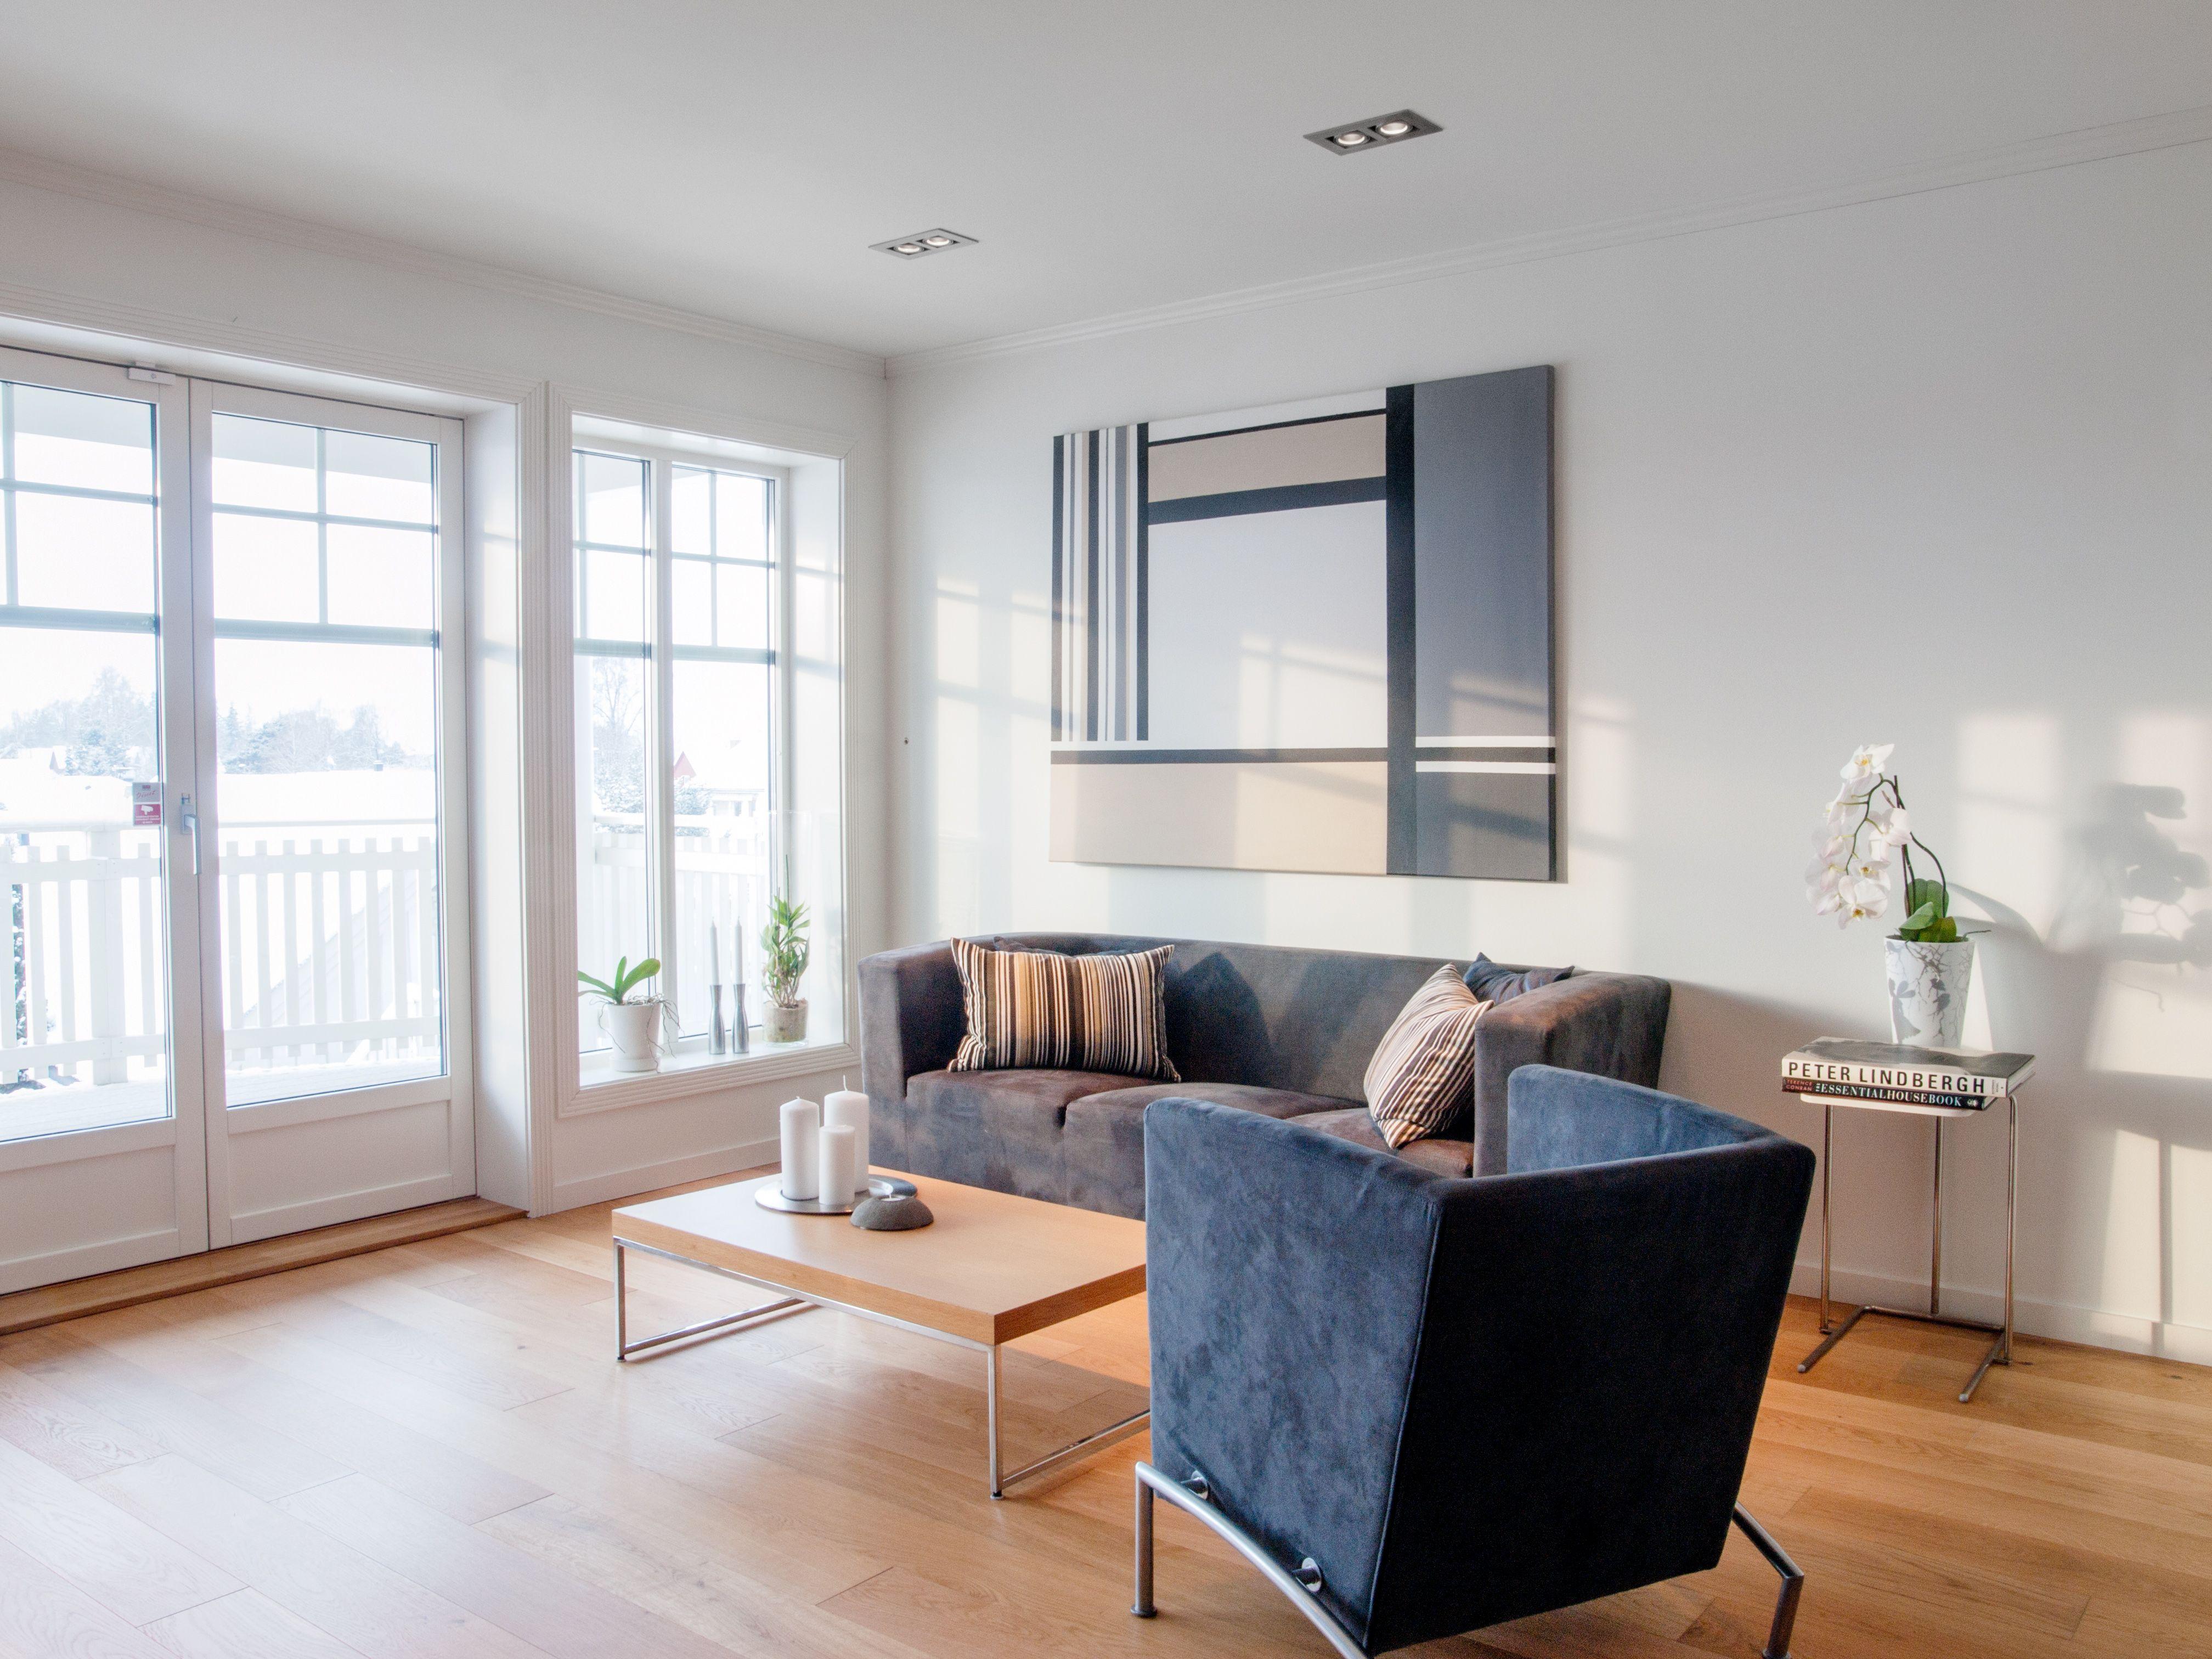 Loftsstue living room i Raumarheim fra